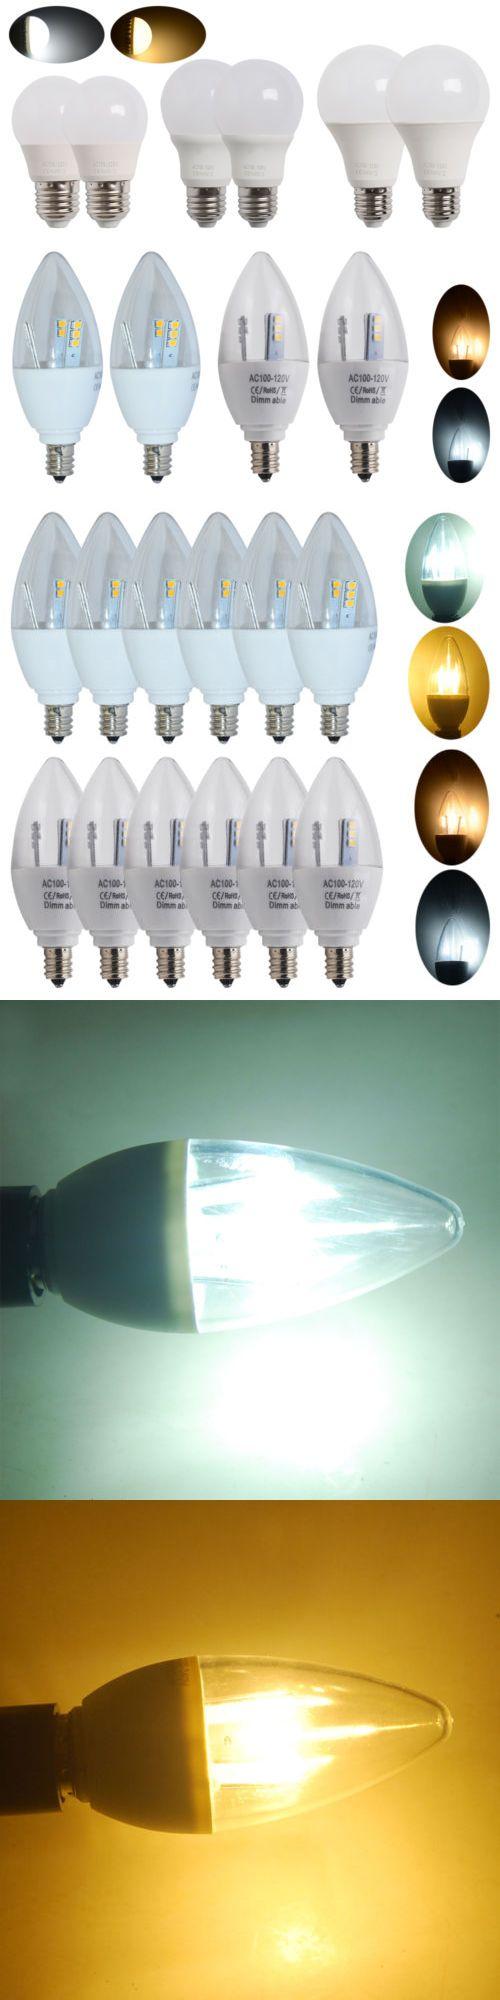 1000 images about lightbulb things on pinterest lightbulbs bulbs - Light Bulbs 20706 E26 E12 Candelabra Led Light Bulb 5w 8w 10w 12w Candle Light